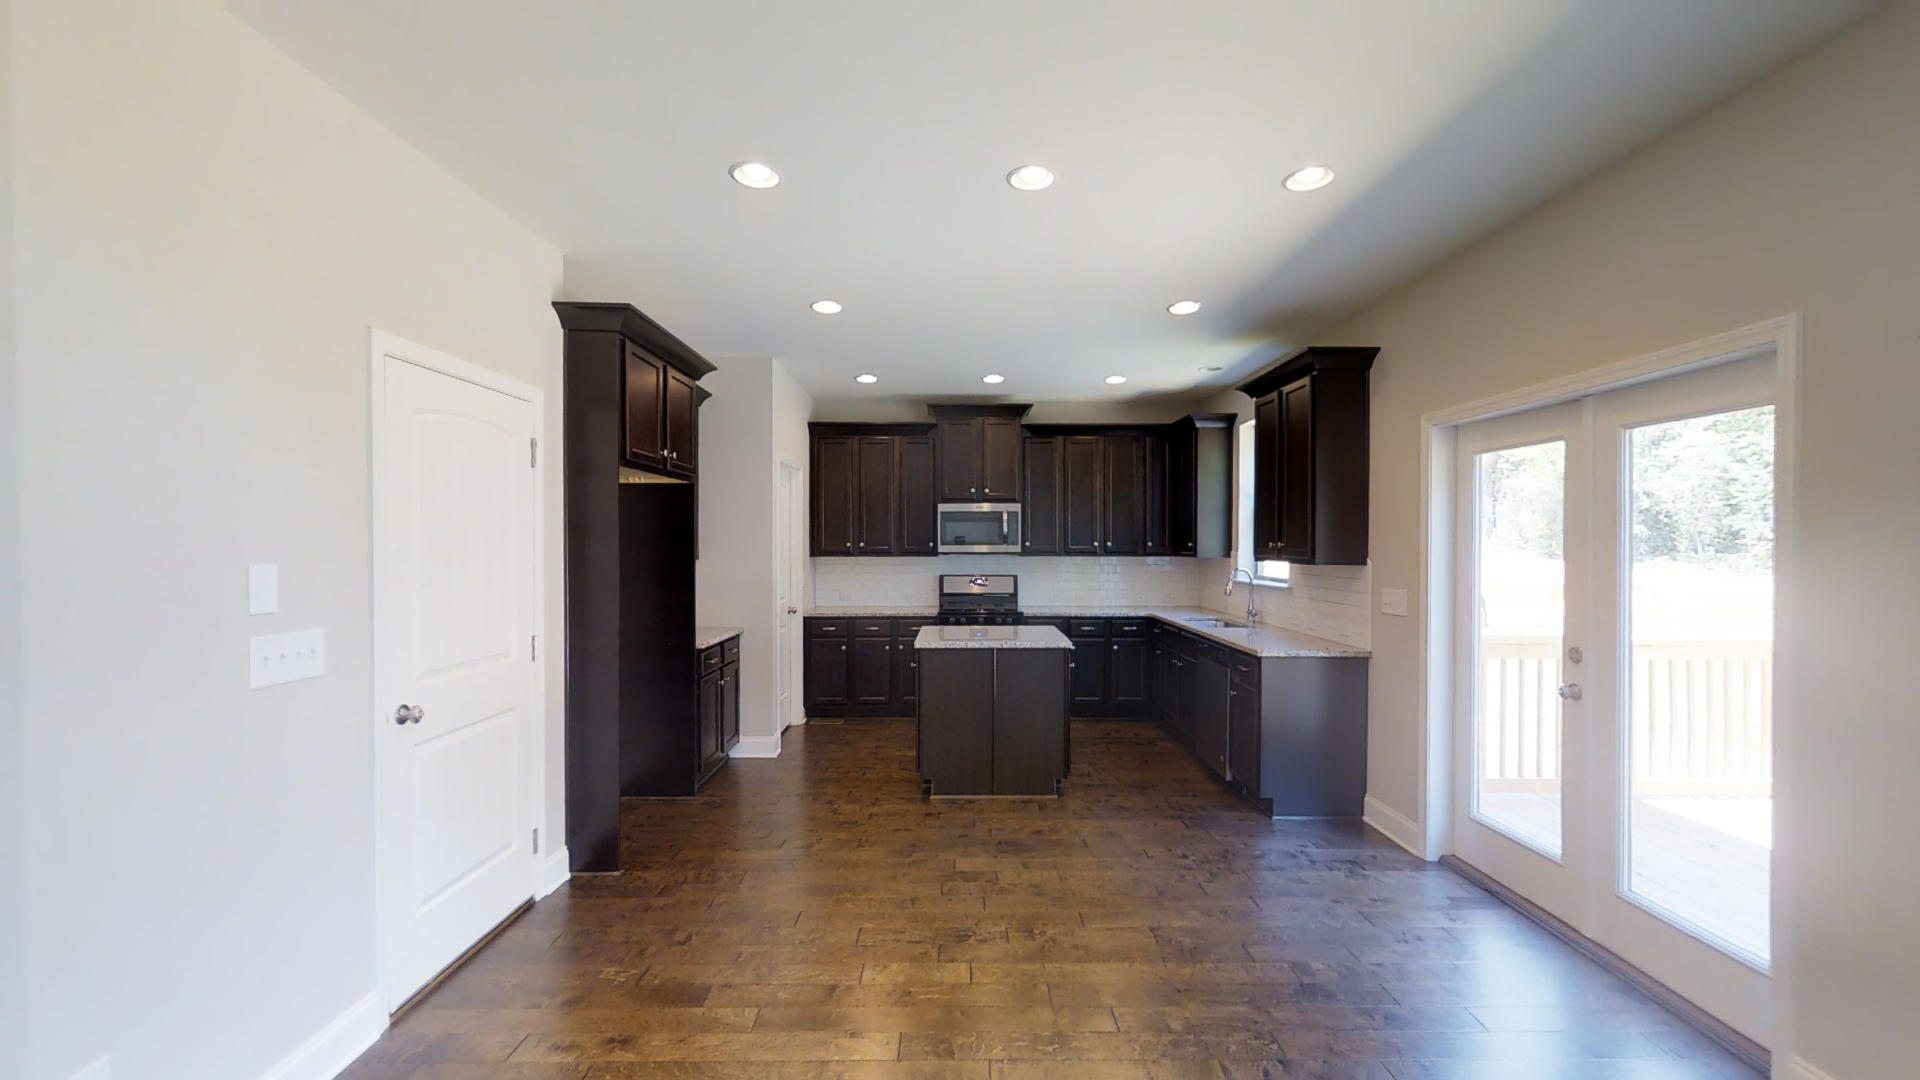 SR Homes: The Millcreek Plan